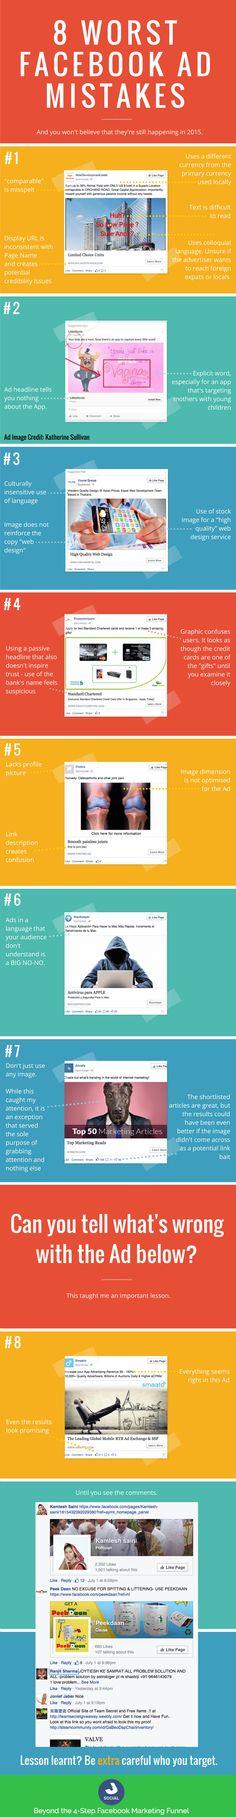 8 Worst Facebook Ads Mistakes #Infographic @jasonhjh